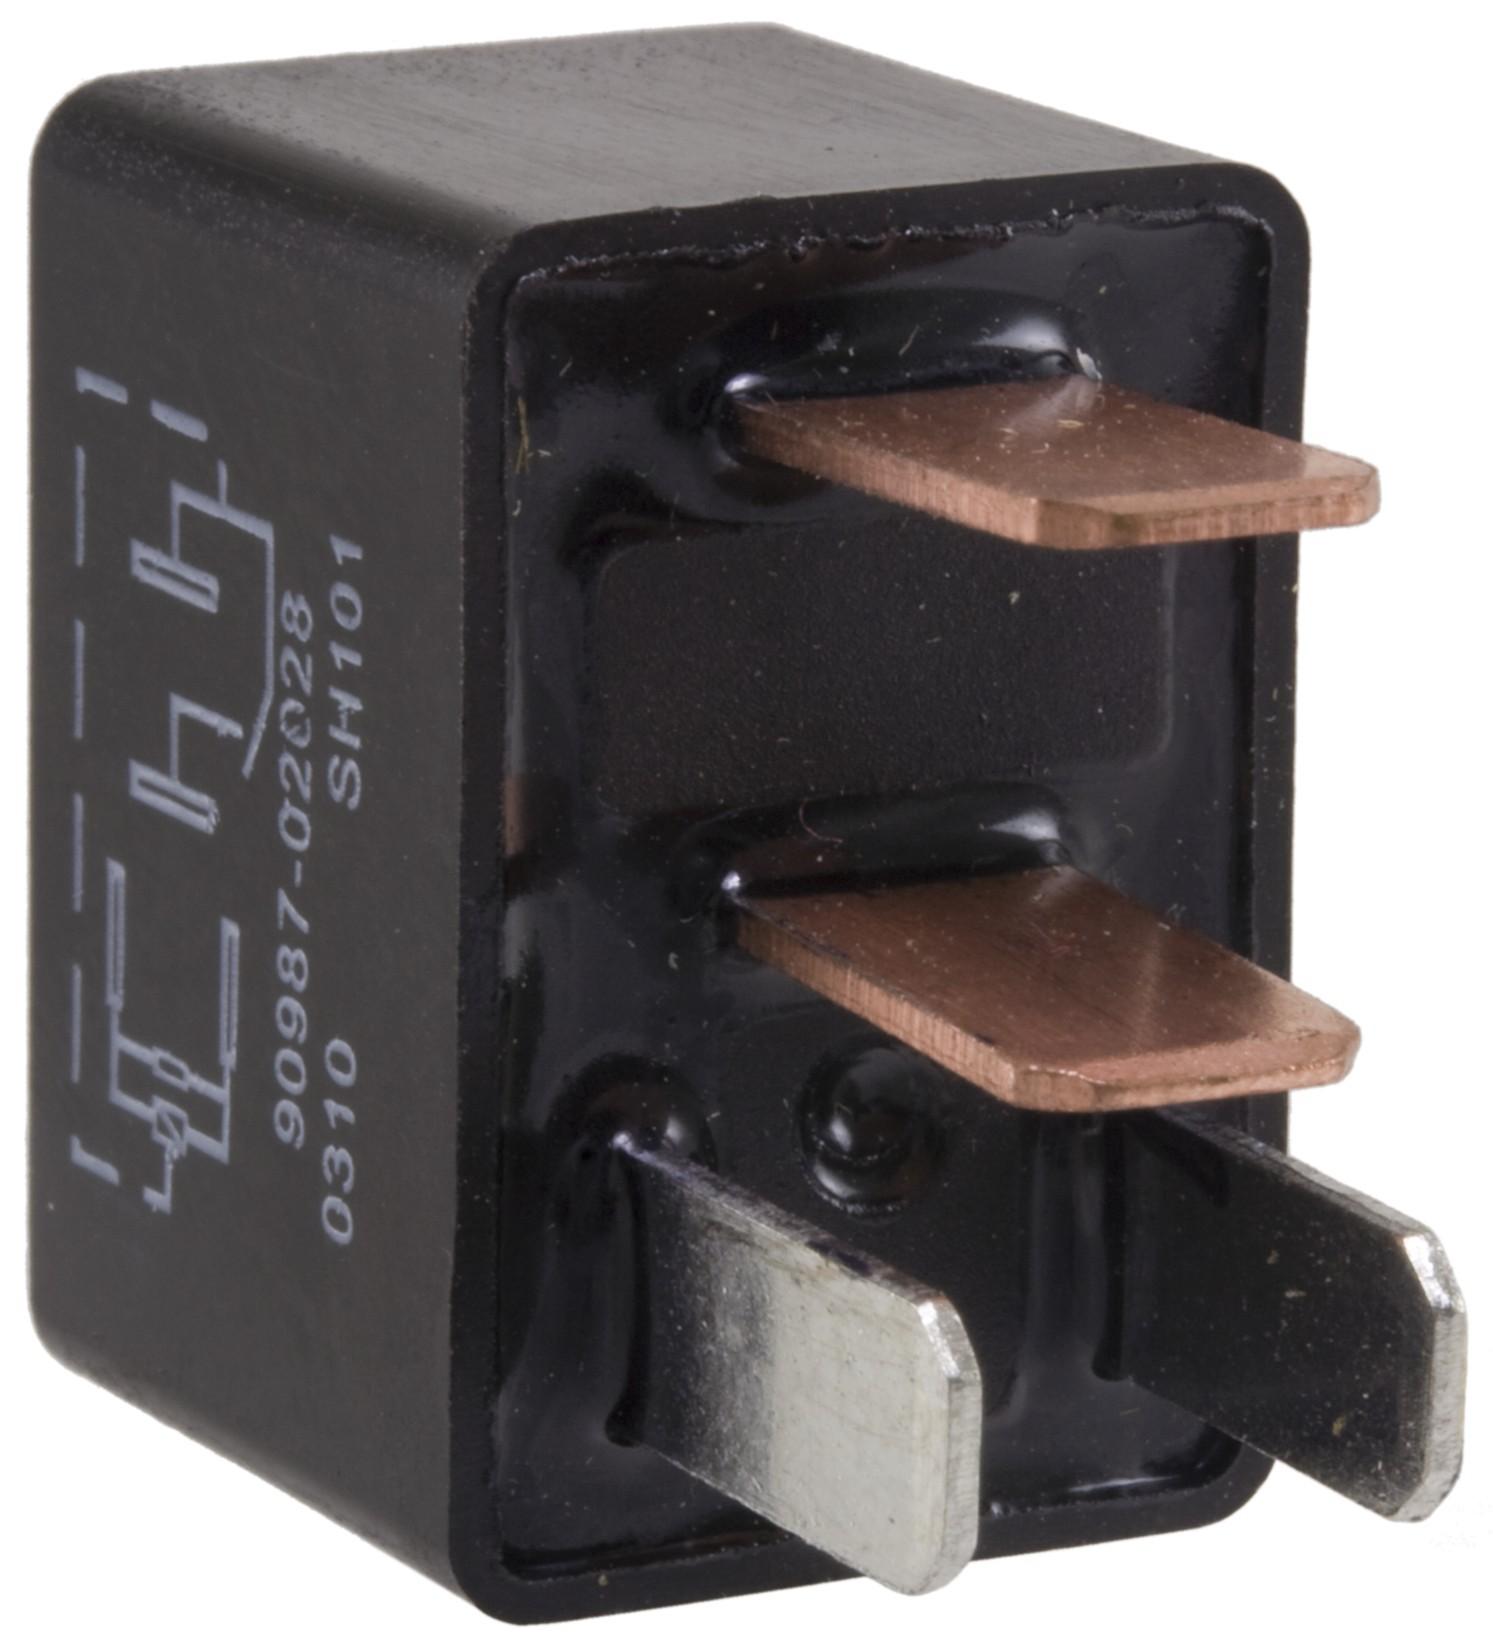 AIRTEX ENG MGMT SYSTEMS(DELETE V24A01R1) - A/C Compressor Control Relay - AEM 1R1696